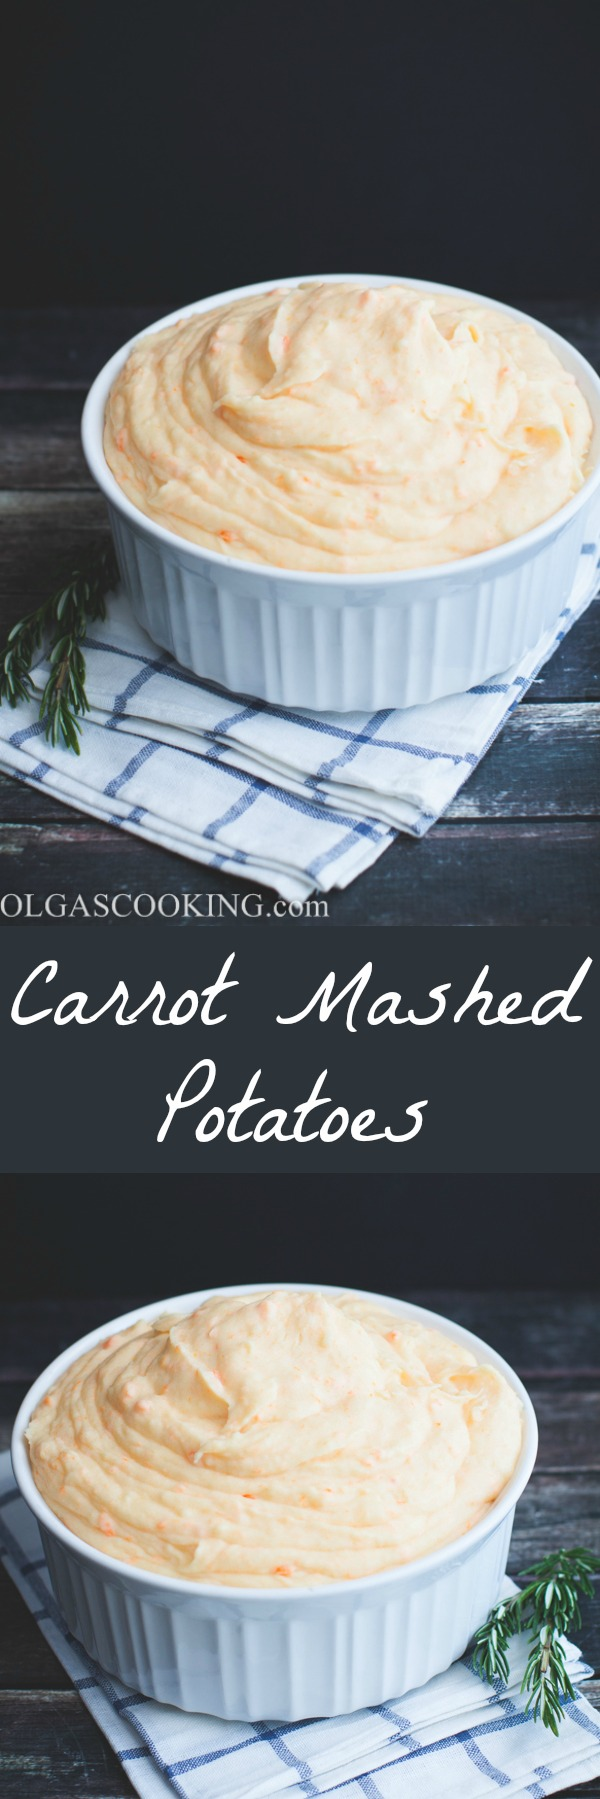 Creamy Carrot Mashed Potatoes